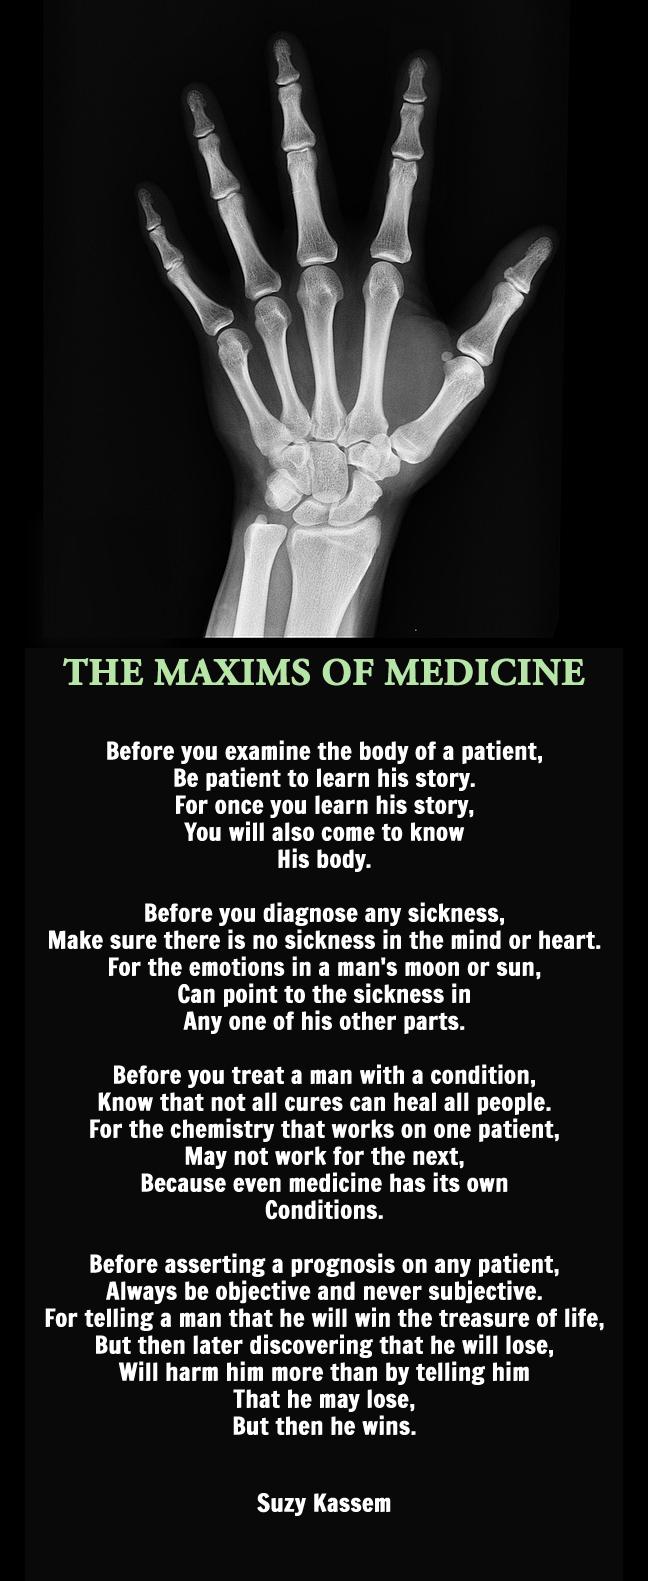 Maxims of Medicine